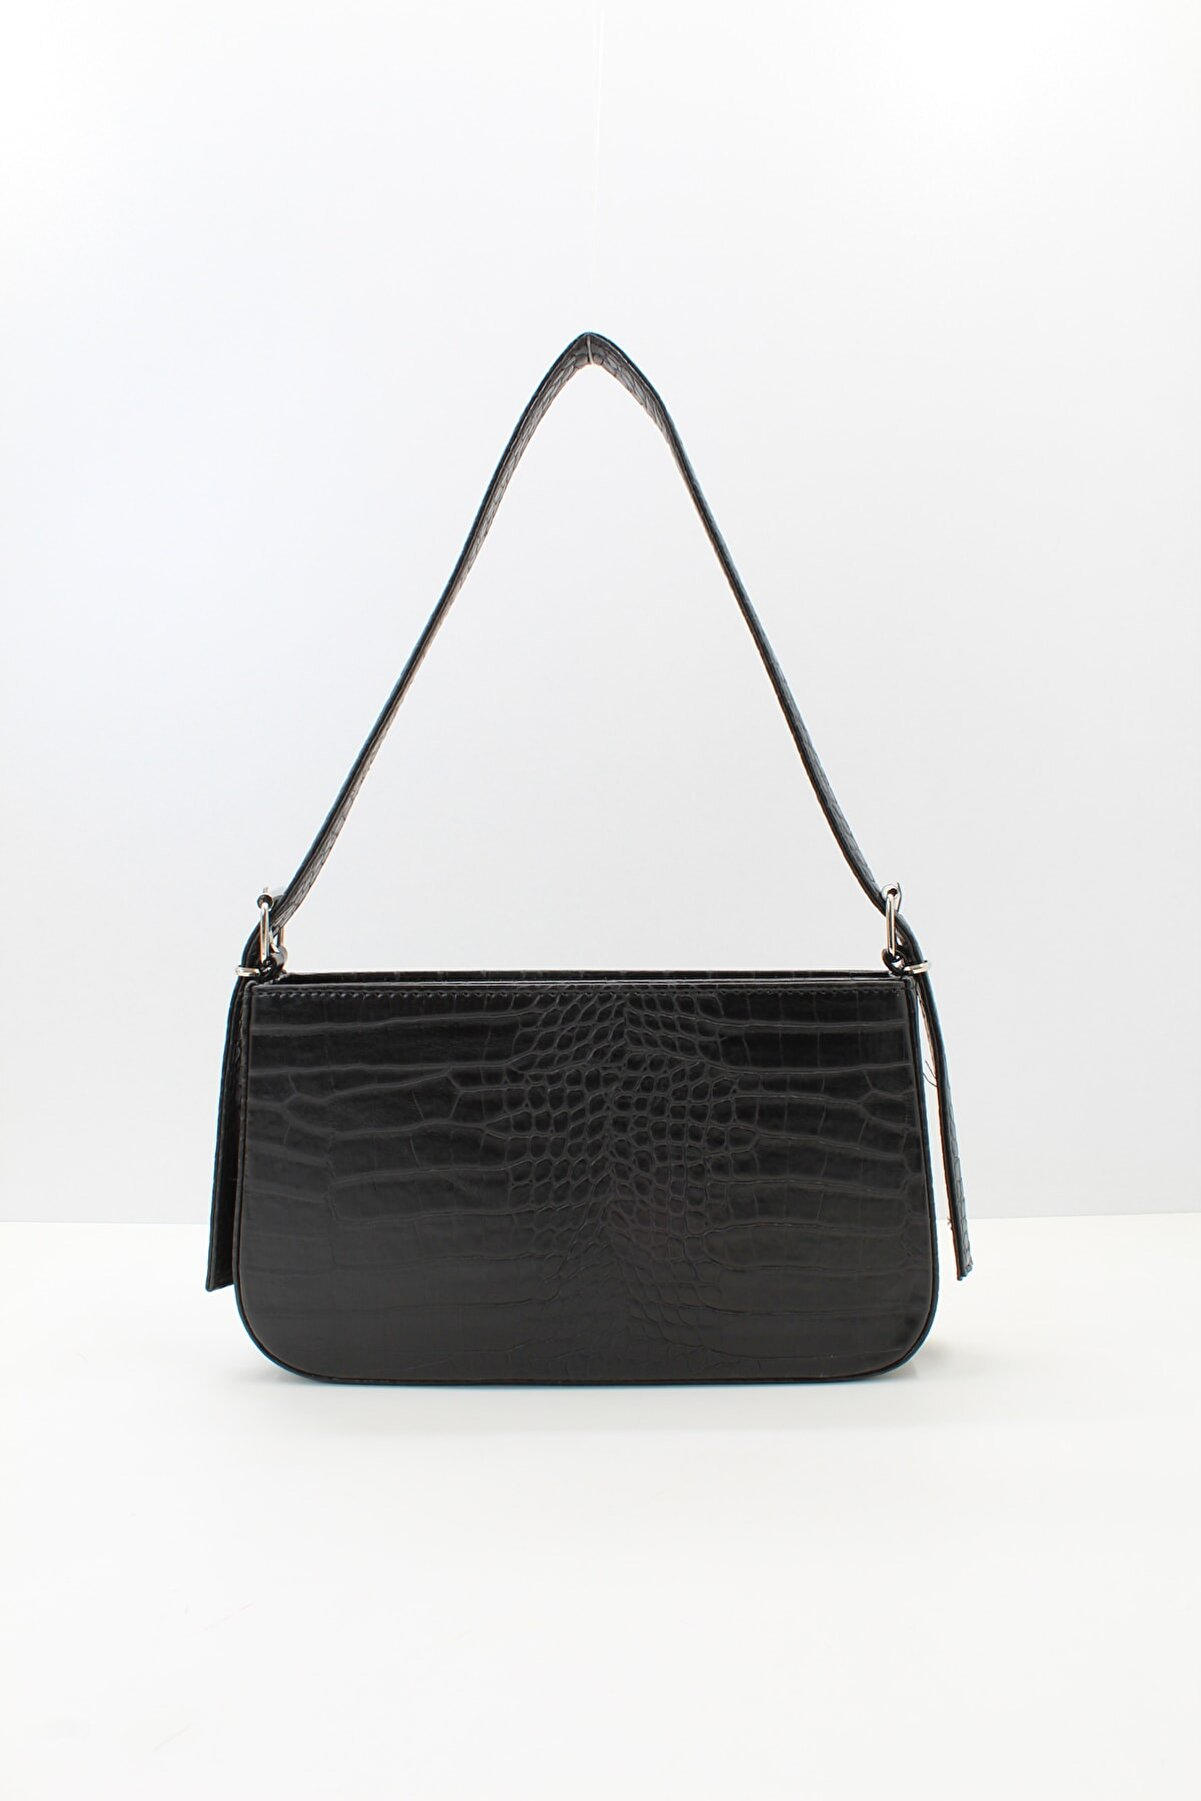 roma italy Kadın Siyah Kroko Fermuarlı Baget Çanta